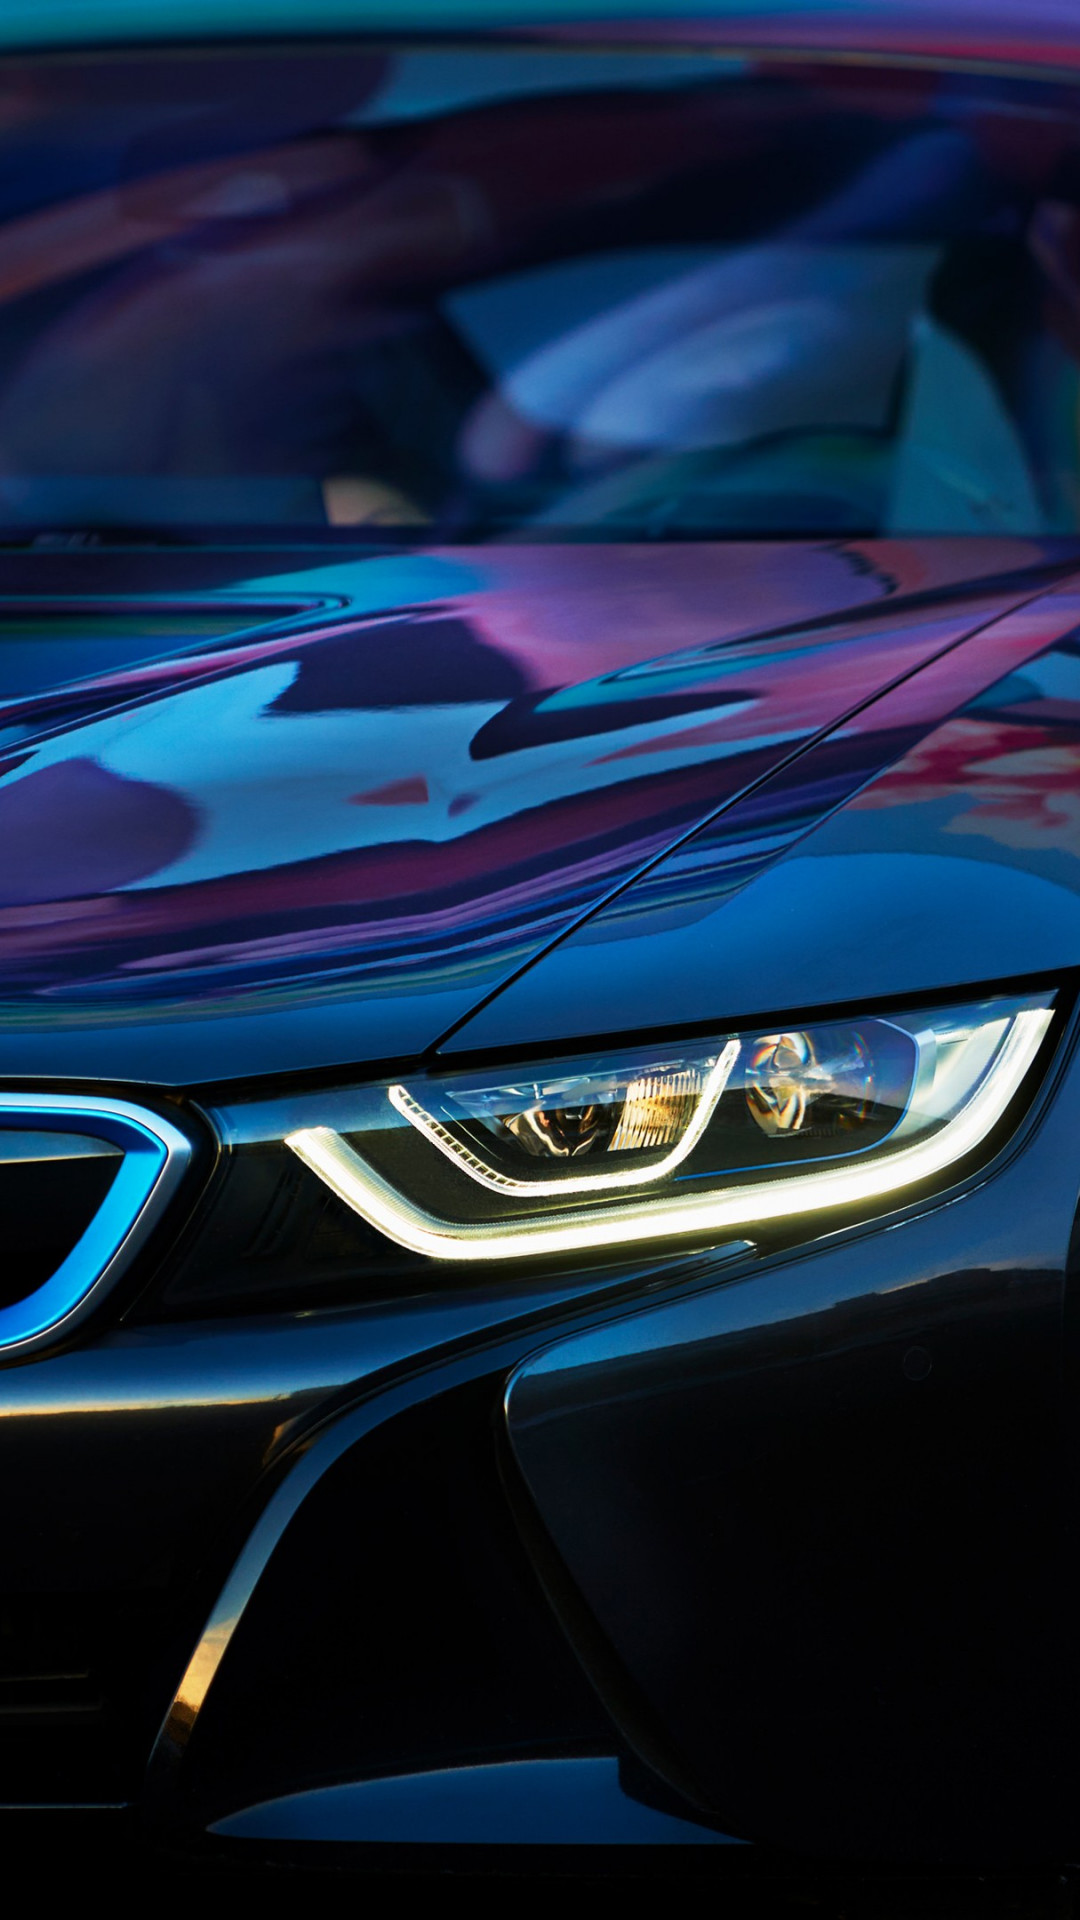 Download wallpaper: BMW i8 1080x1920